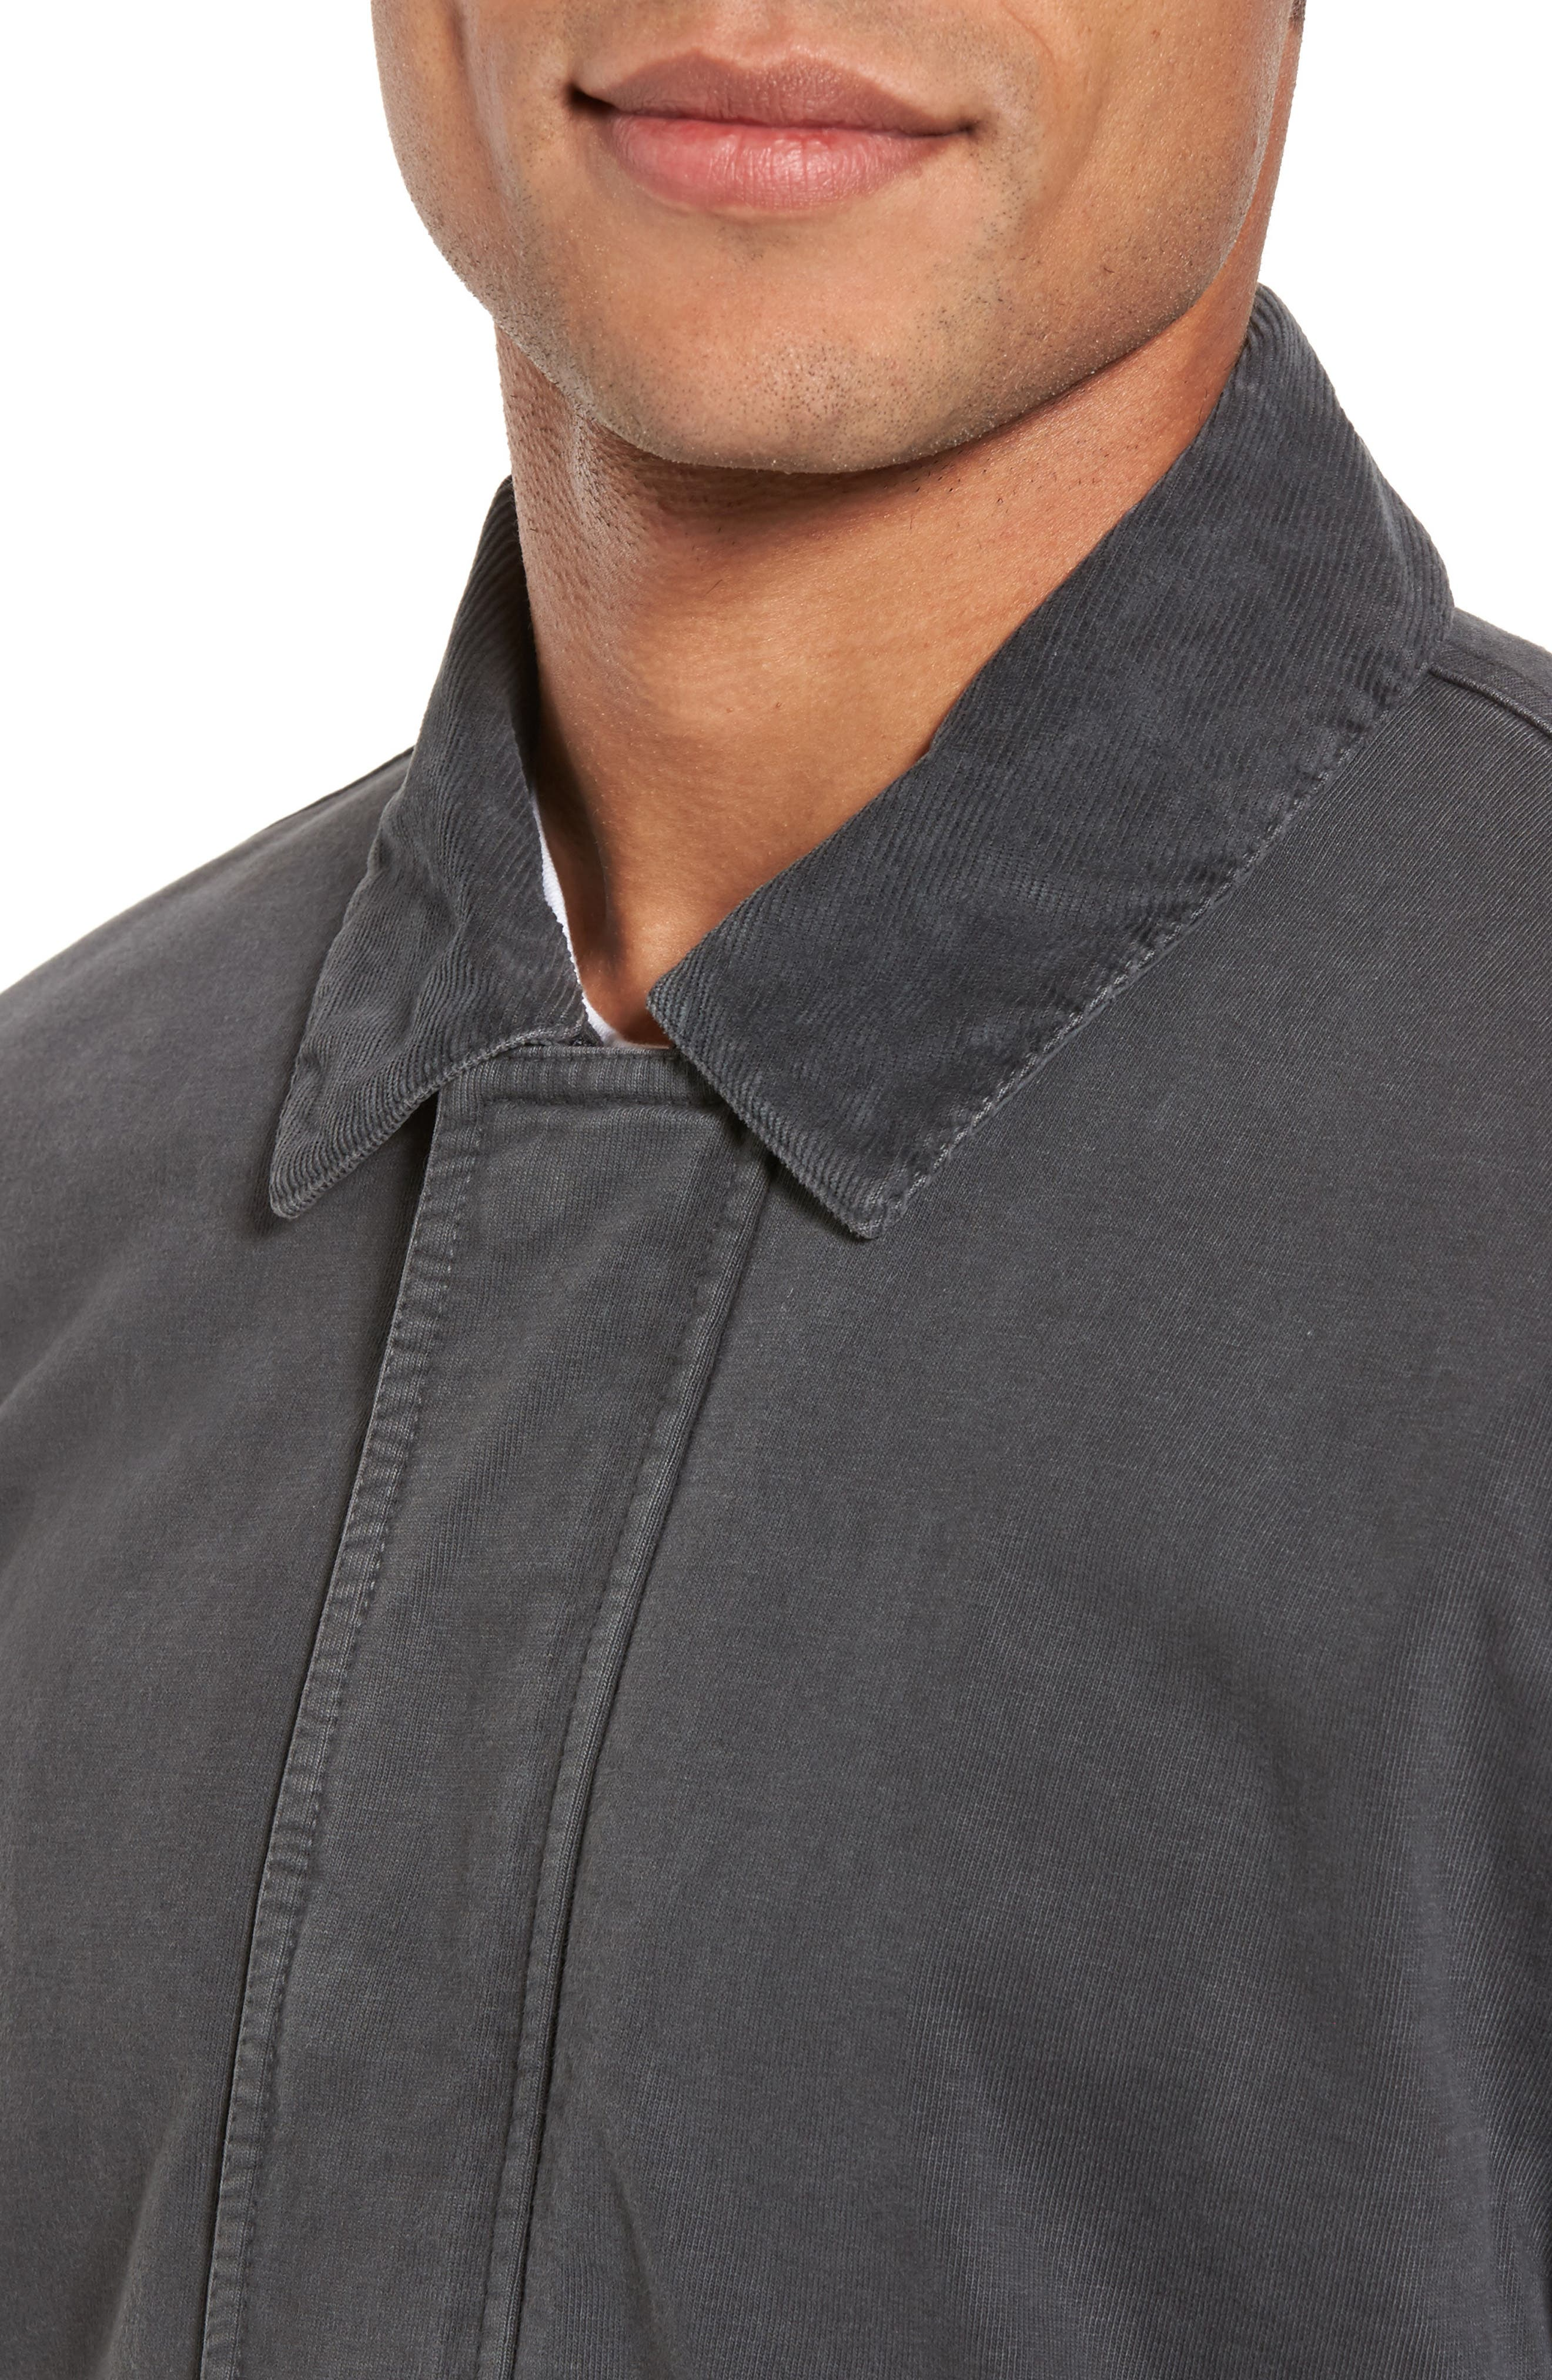 Garment Dyed Field Jacket,                             Alternate thumbnail 4, color,                             020